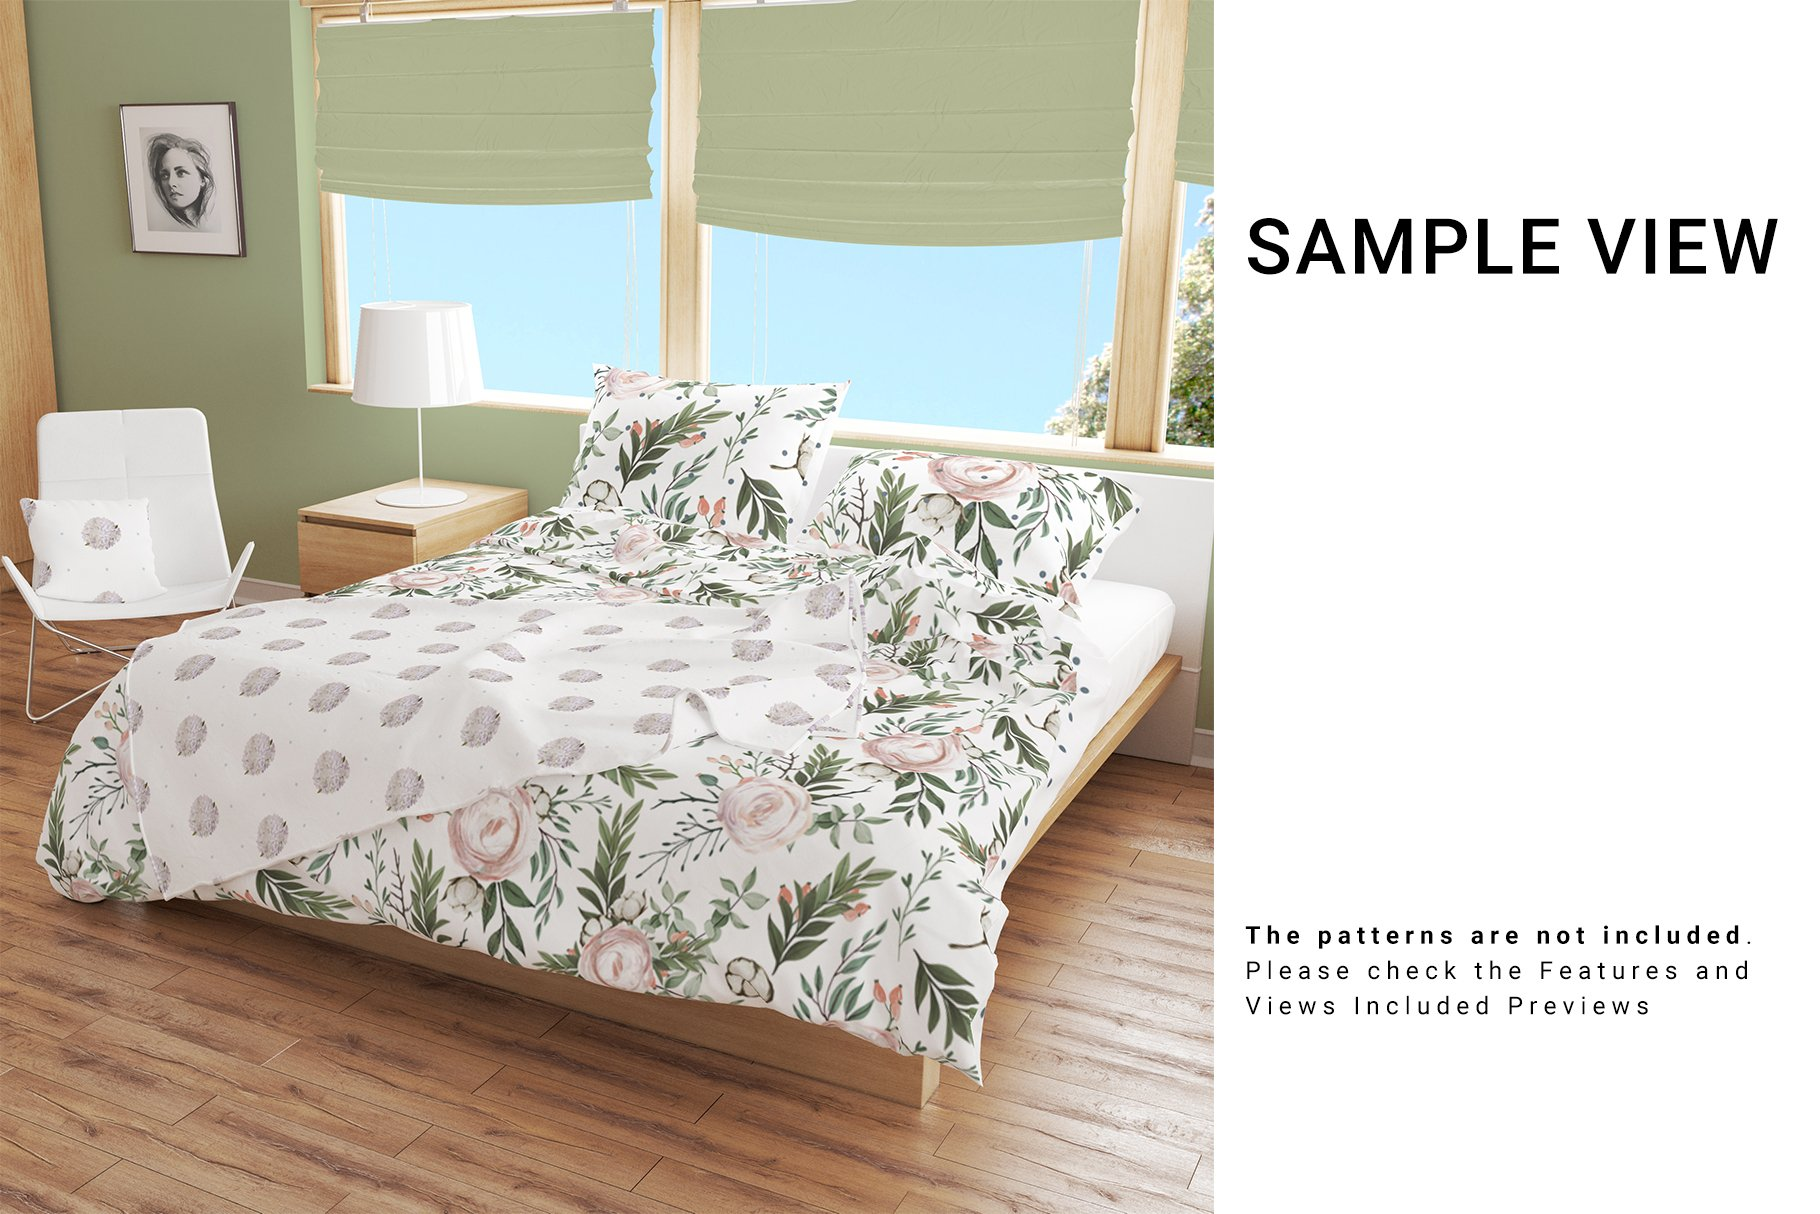 Bedroom Set - Bedding & Throw Pillow example image 6